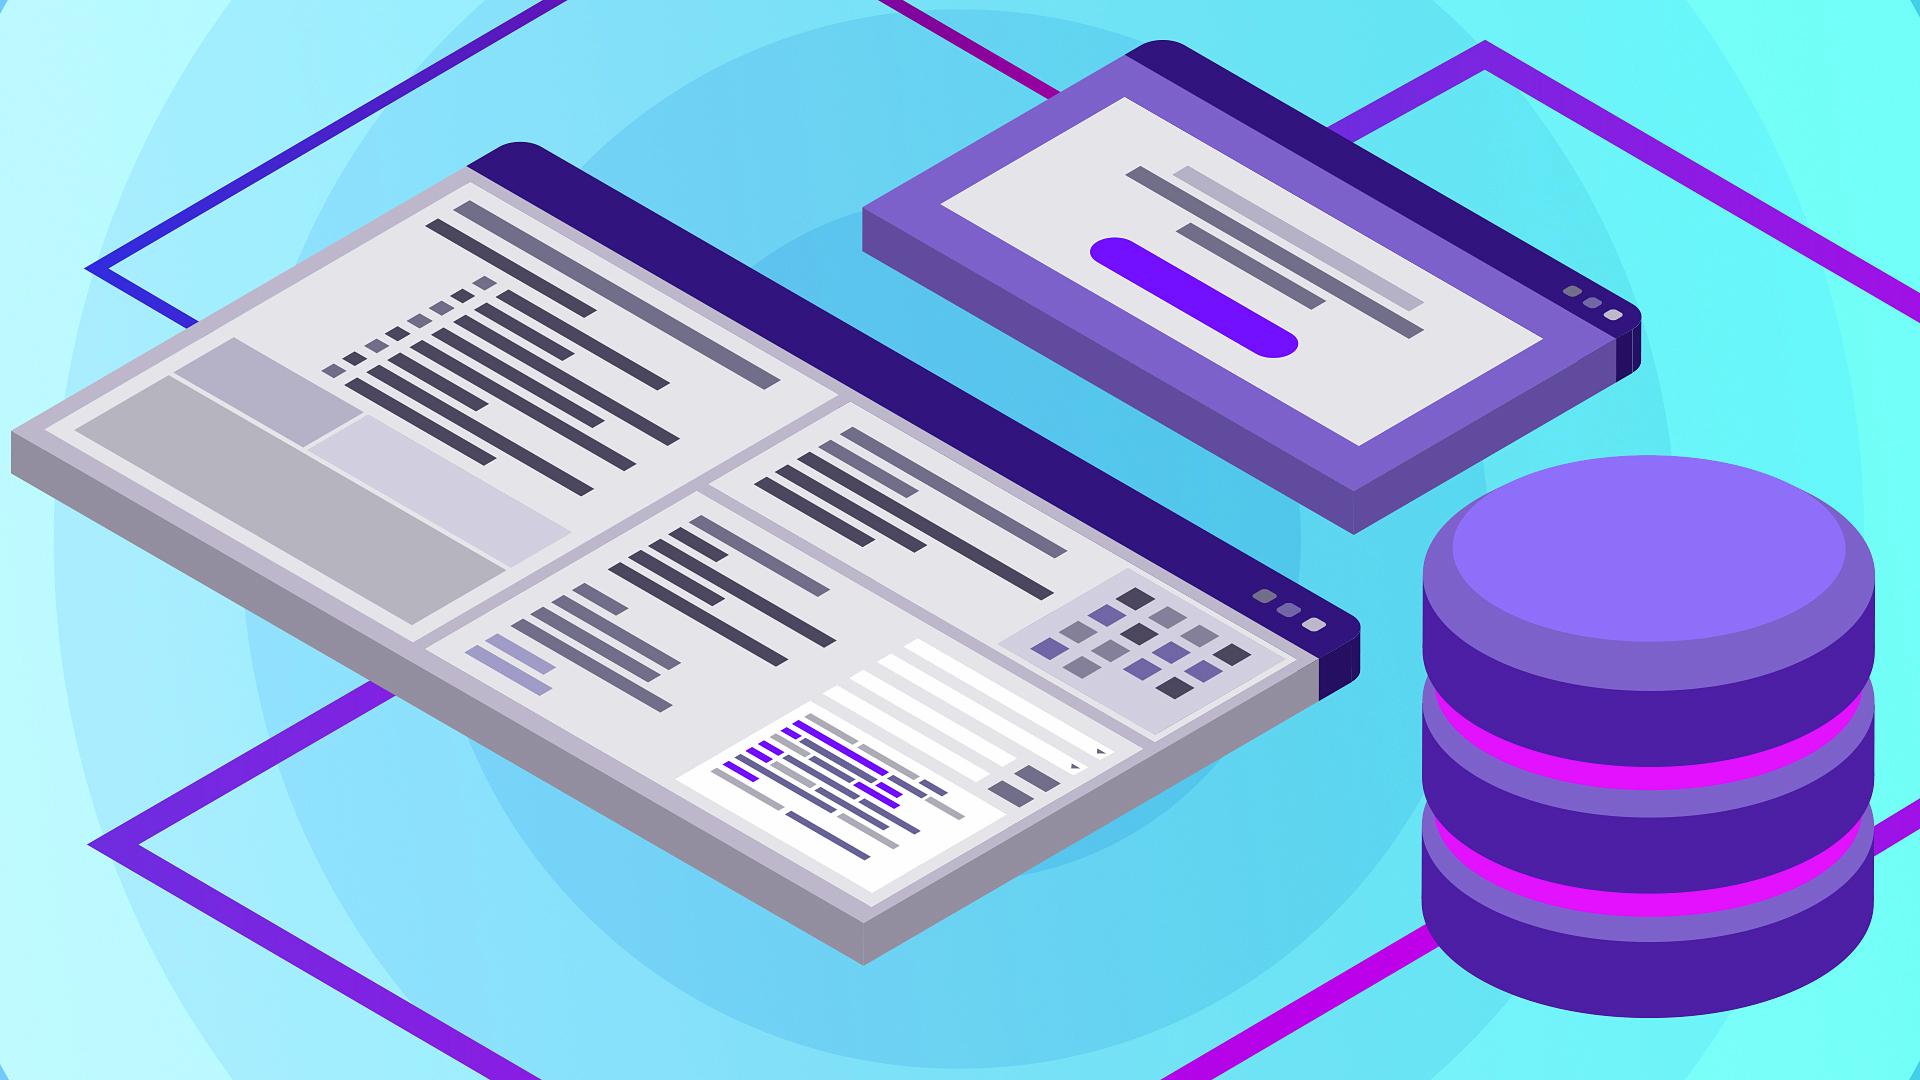 Вебинар Модули SQL Server: представления, процедуры, функции фото